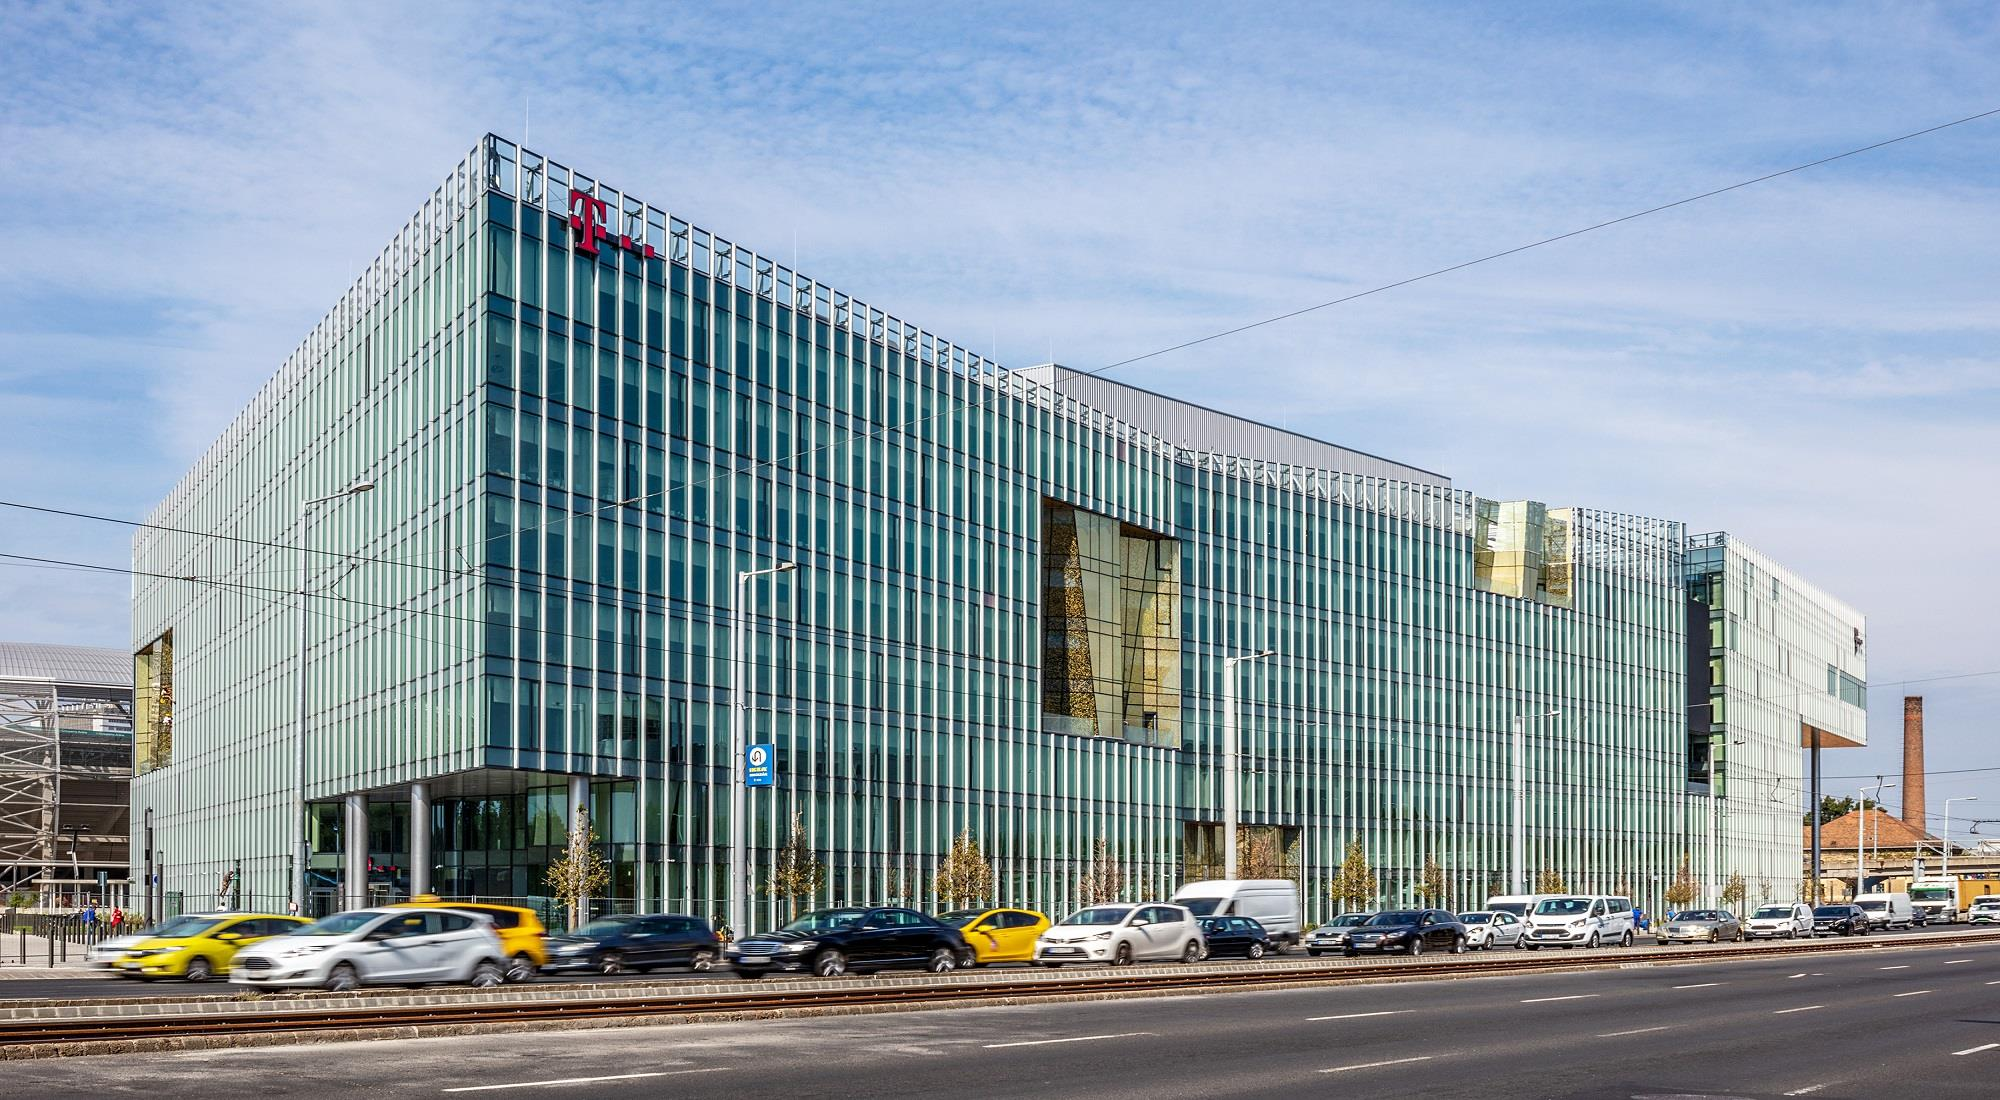 https://alukoenigstahl.md/wp-content/uploads/sites/4/2020/09/Telekom1.jpg